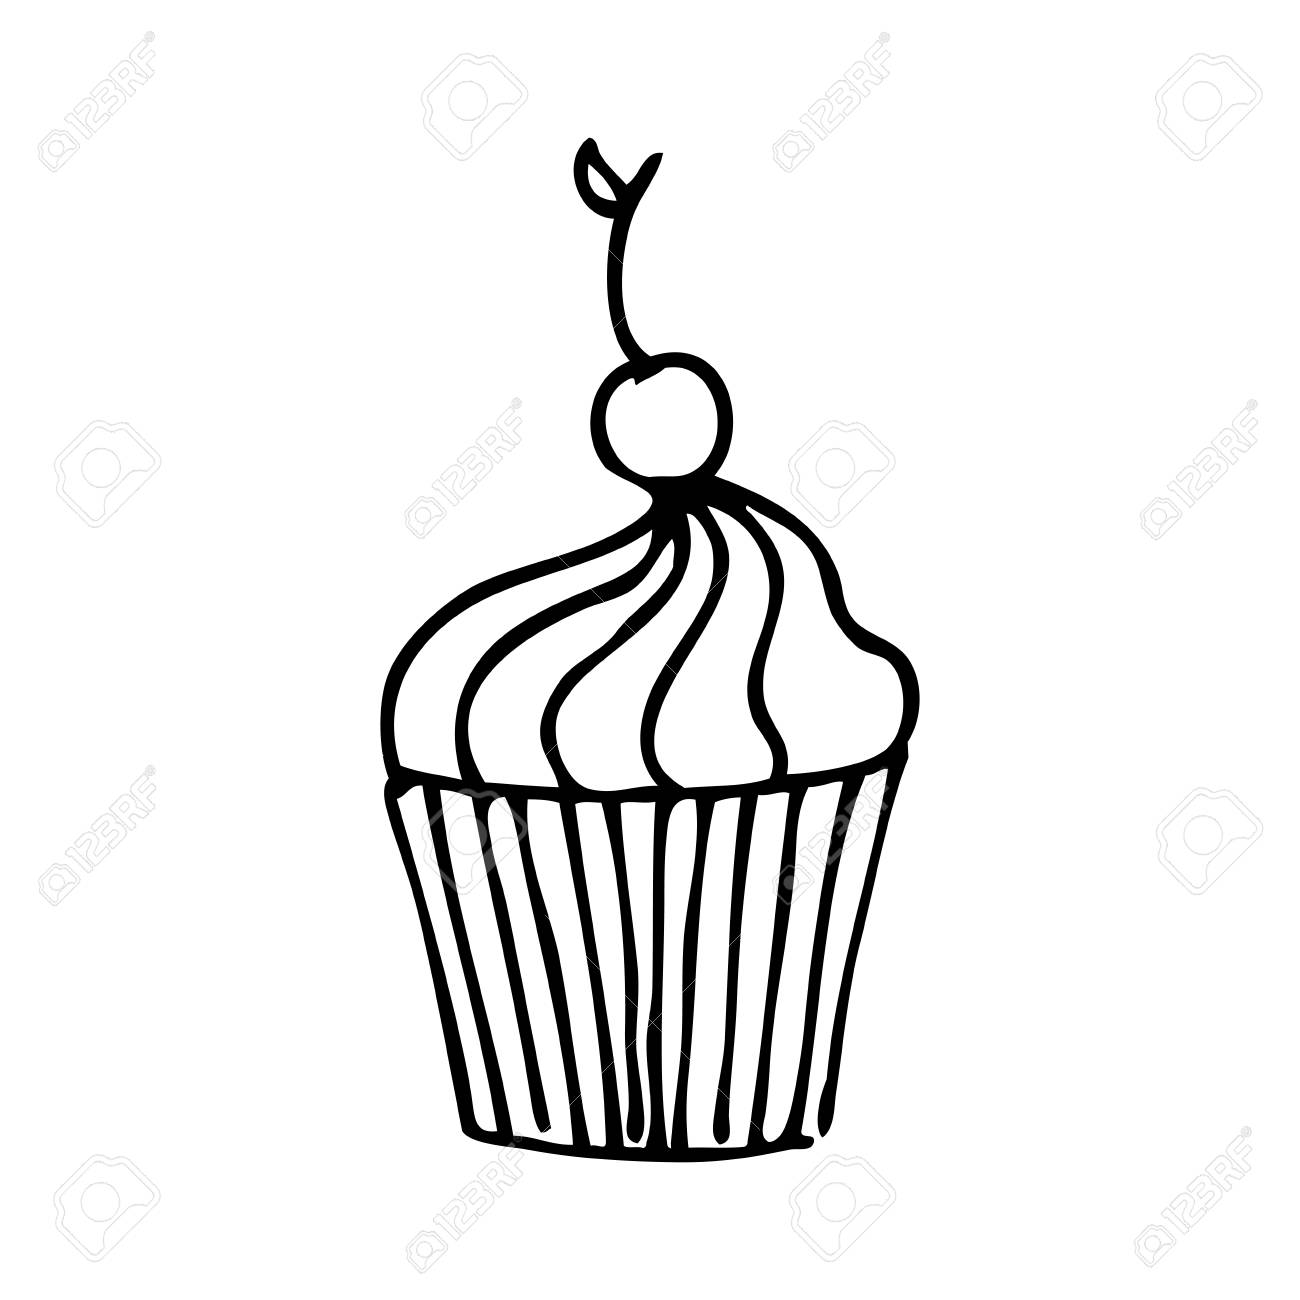 1300x1300 Delicious Cupcake Drawing Icon Vector Illustration Design Royalty